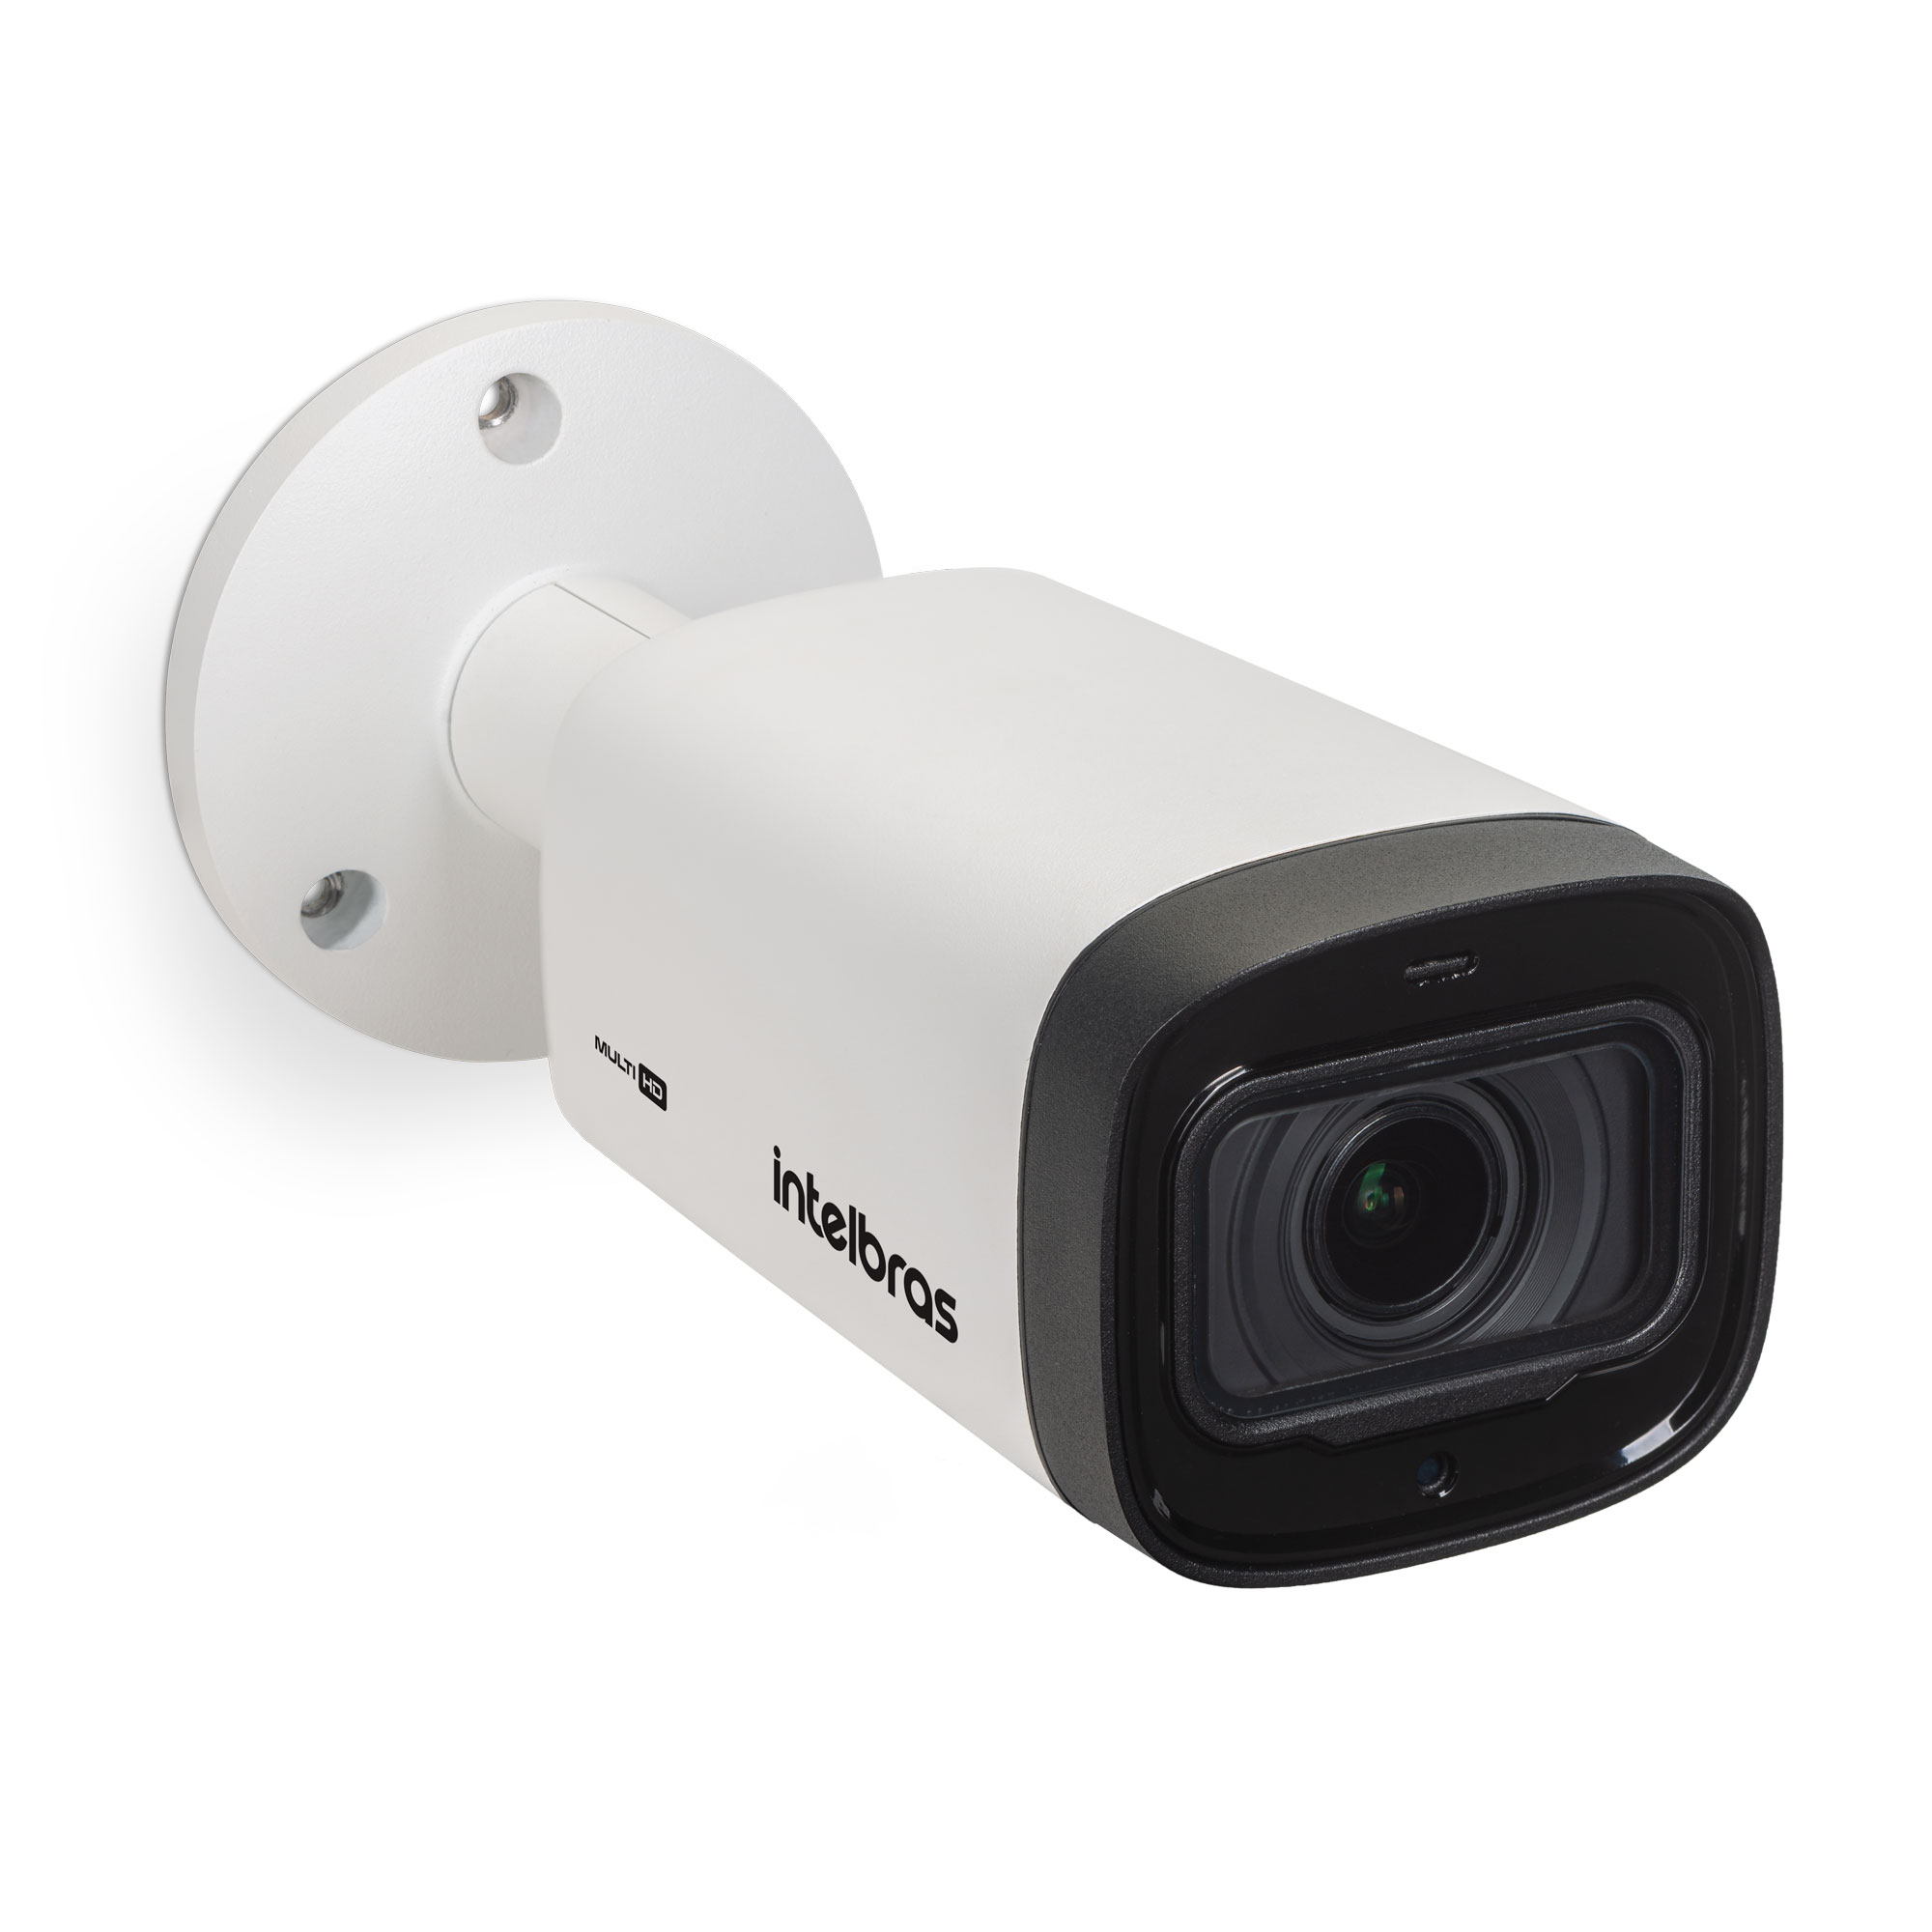 Câmera Bullet FullHD Varifocal VHD 3240 Z G5 Intelbras